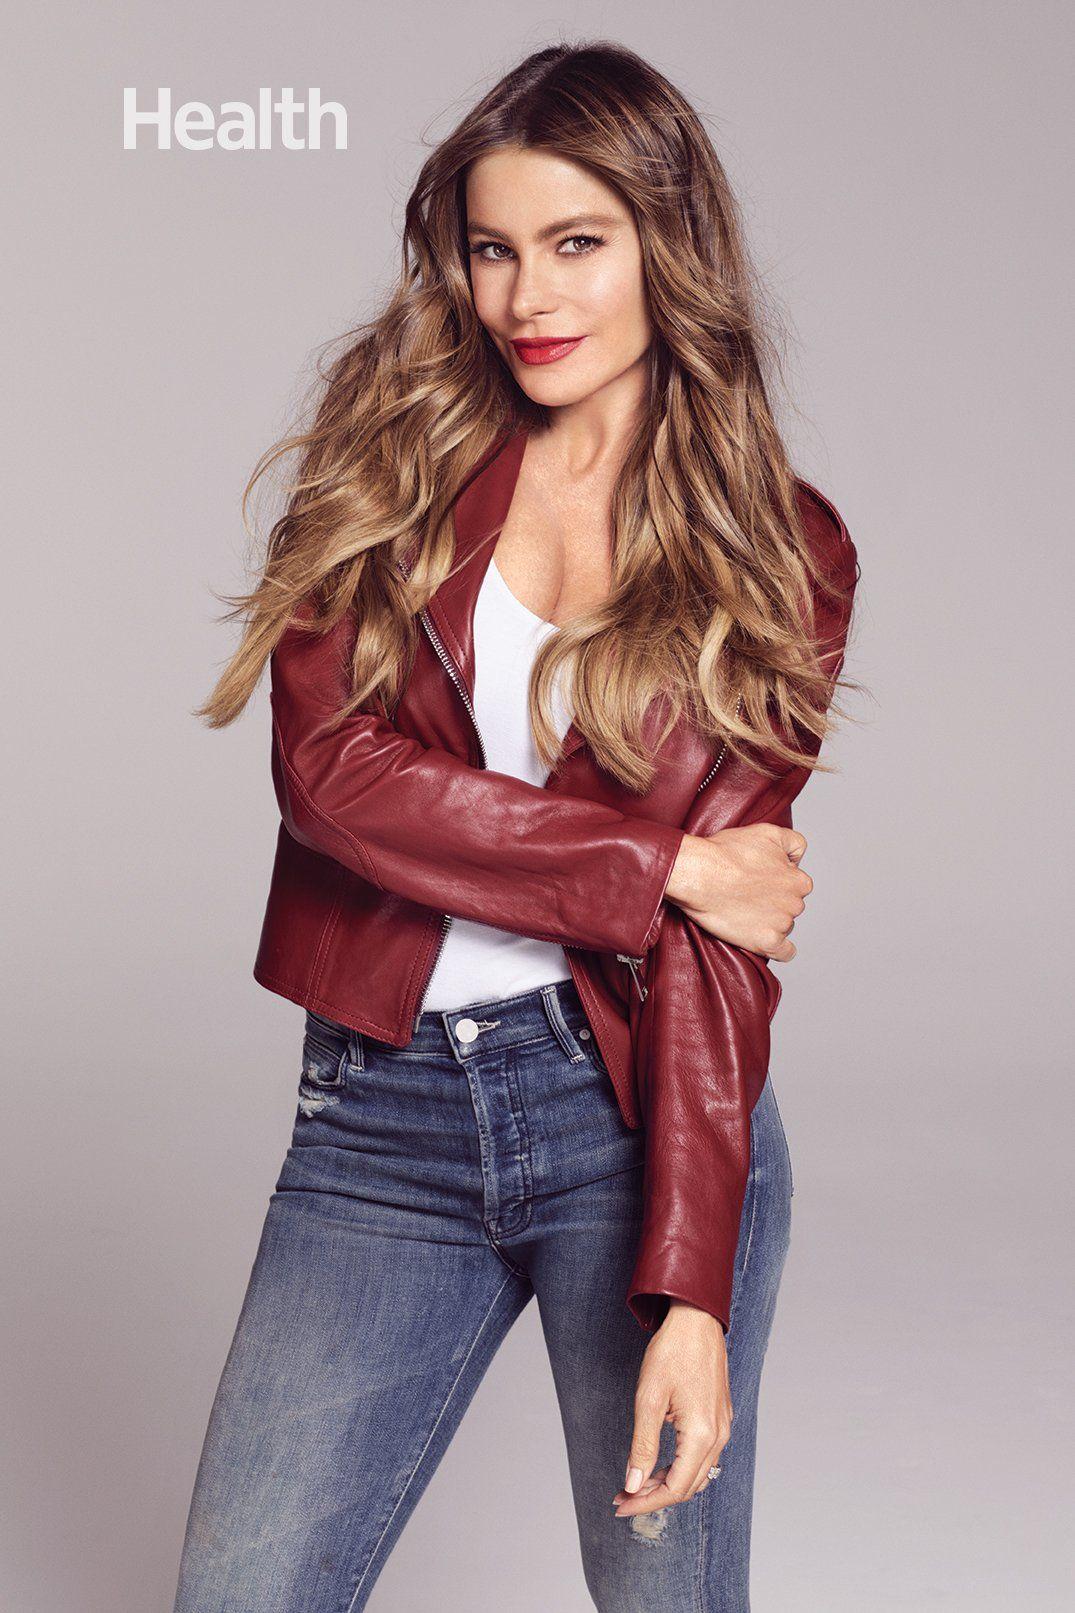 Sofia Vergara Talks 'Modern Family,' Skincare Tips, and